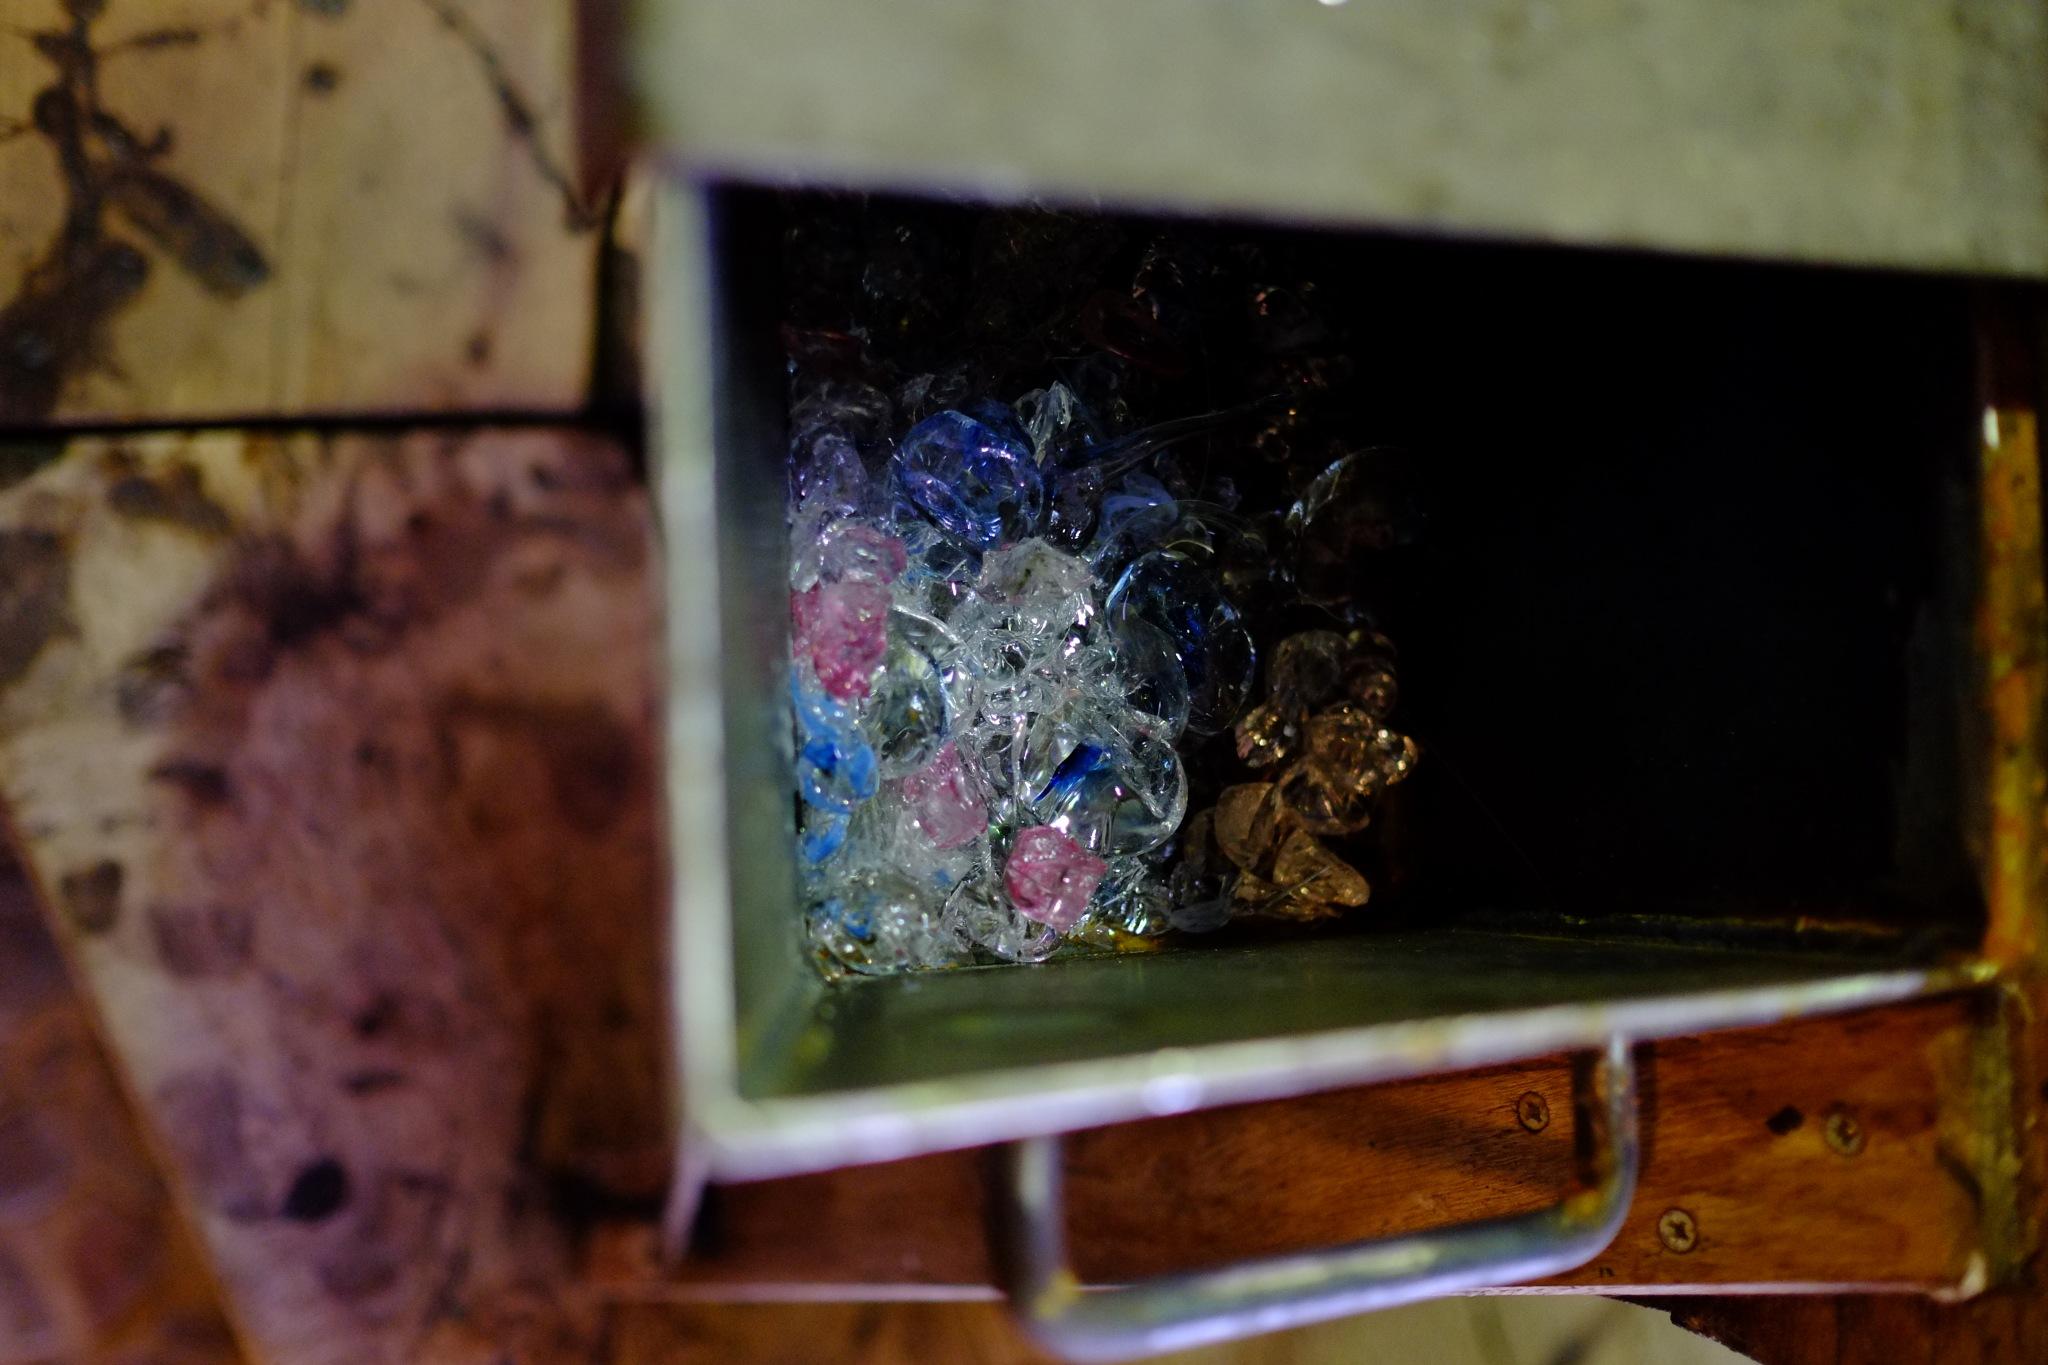 Glasbruch by peterkryzun